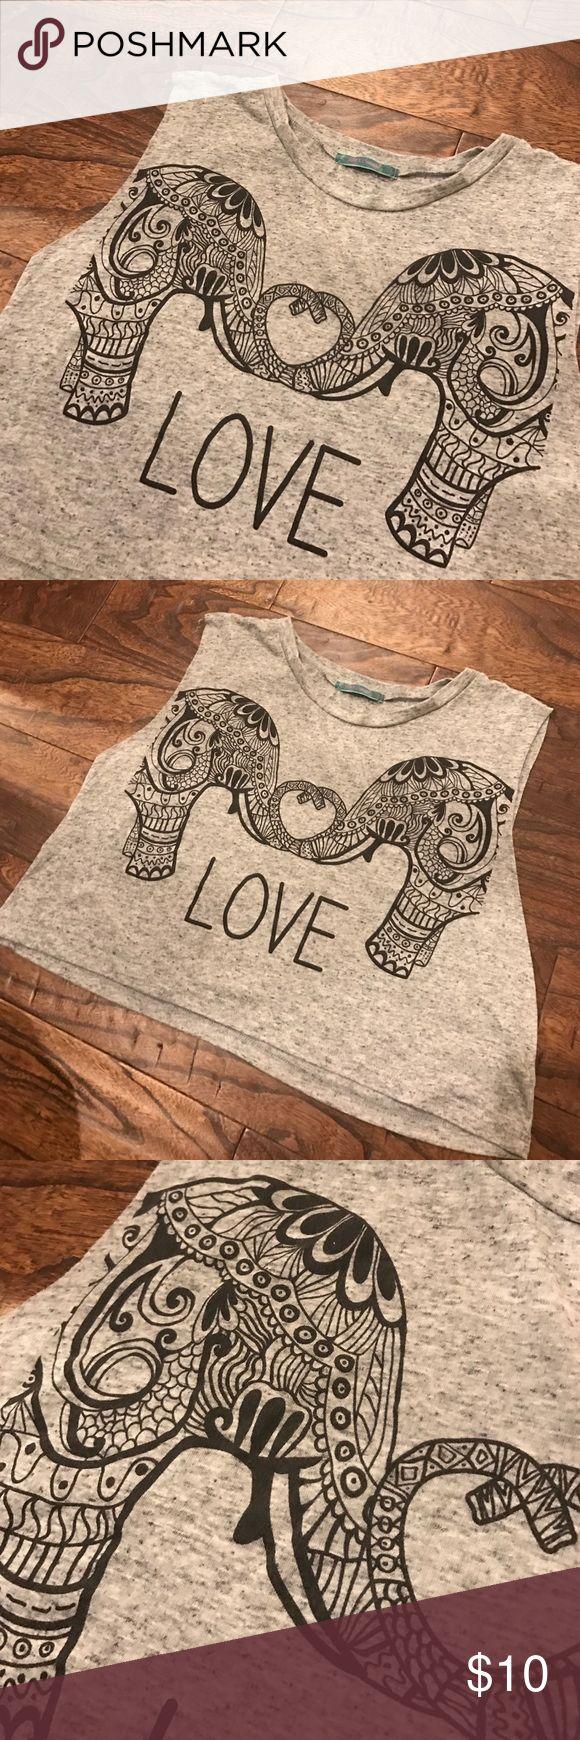 1ba6547a32ea28ff262ffdaa4ec76edc elephant love bathing suit cover up the 7 best images about elephants on pinterest,7 Elephant Swimwear